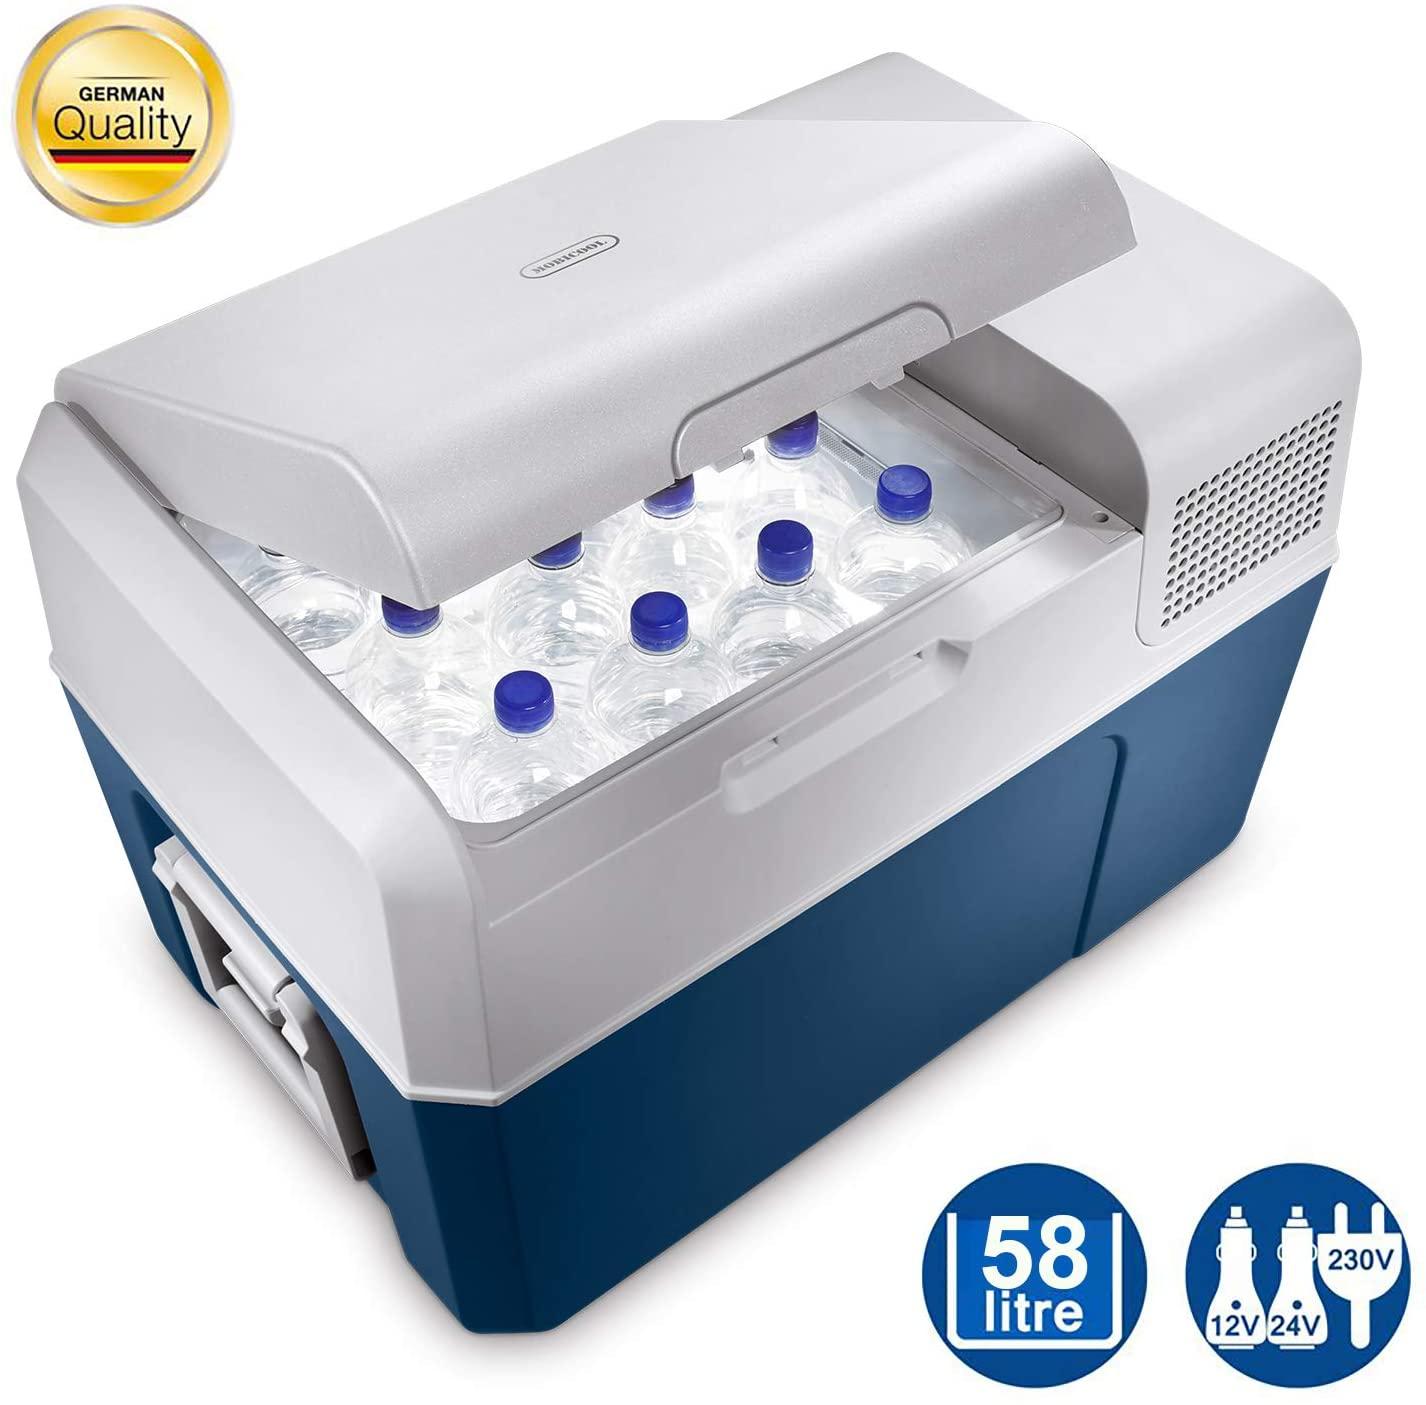 Mobicool MCF60, elektrische Kompressor-Kühlbox, 58 l, 12/24/230 V, Mini-Kühlschrank für Auto, Lkw, Boot + Steckdose, A+, Bestpreis